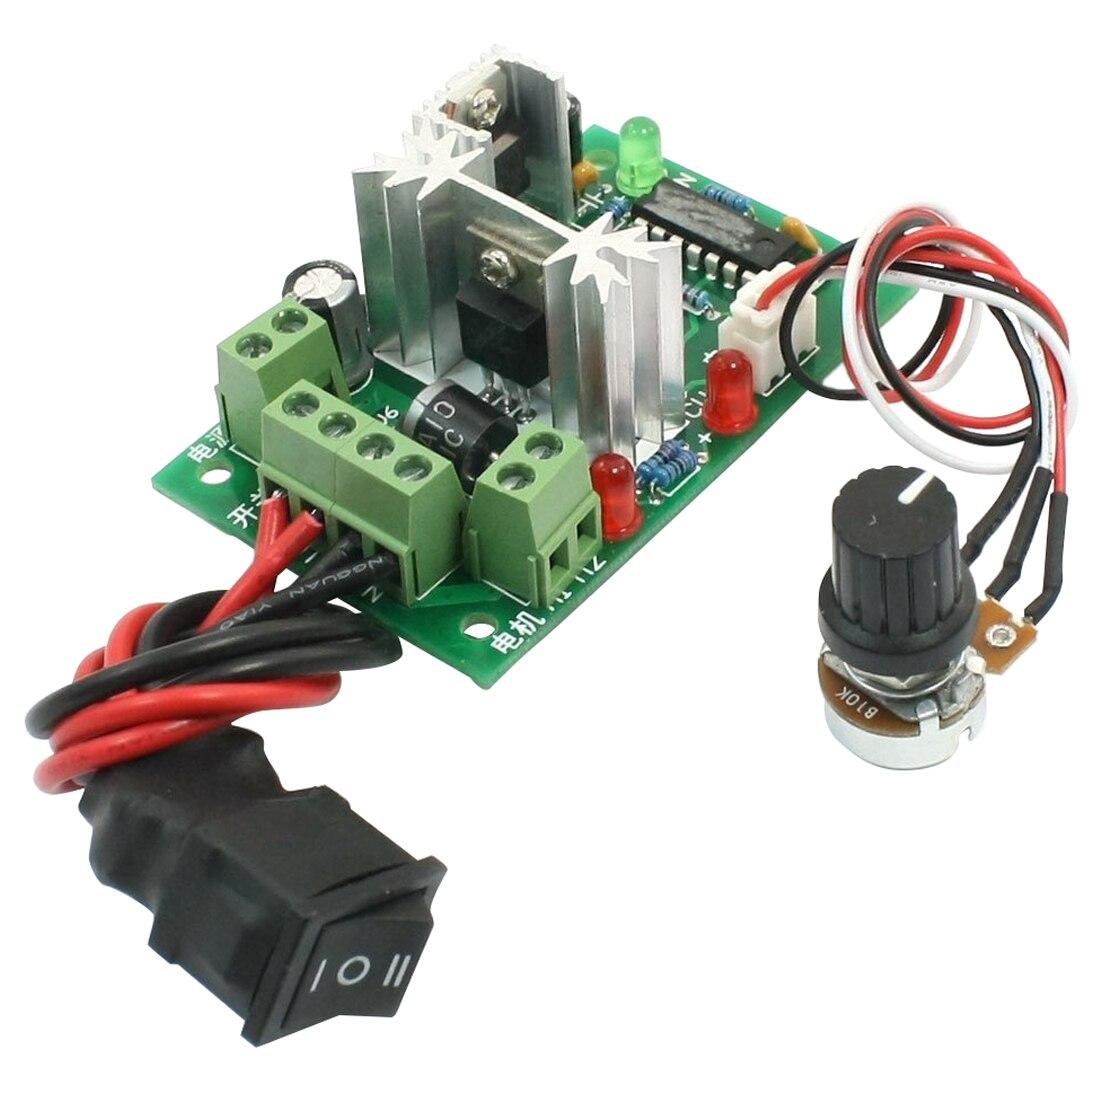 12V 24V 30V 120W PWM Регулируемый Вольт контроллер скорости двигателя постоянного тока CCM2